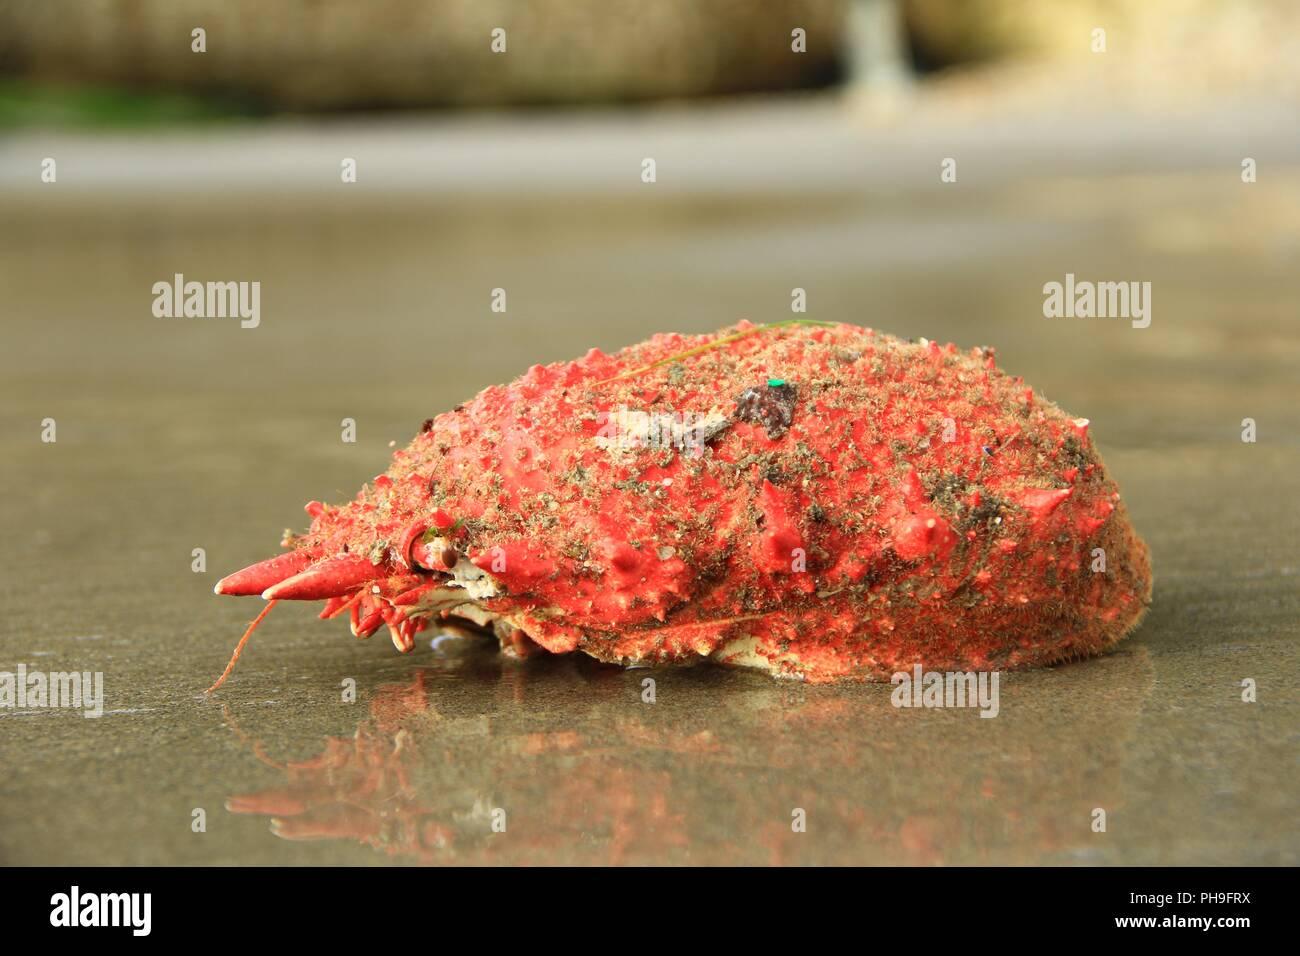 Spinous spider crab (Maja squinado) - Stock Image